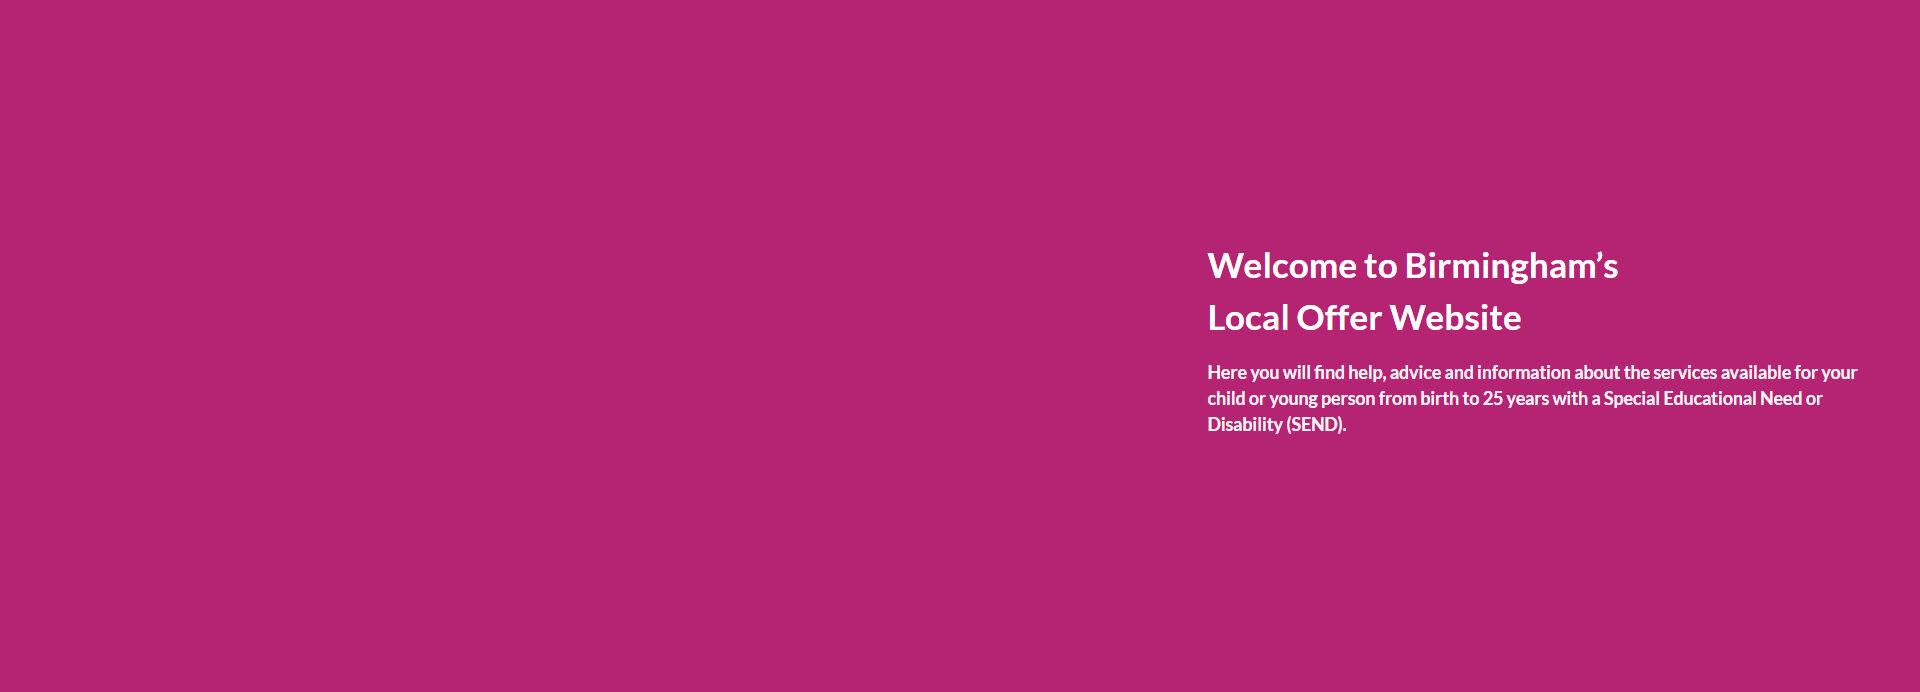 The Birmingham Local Offer website launch